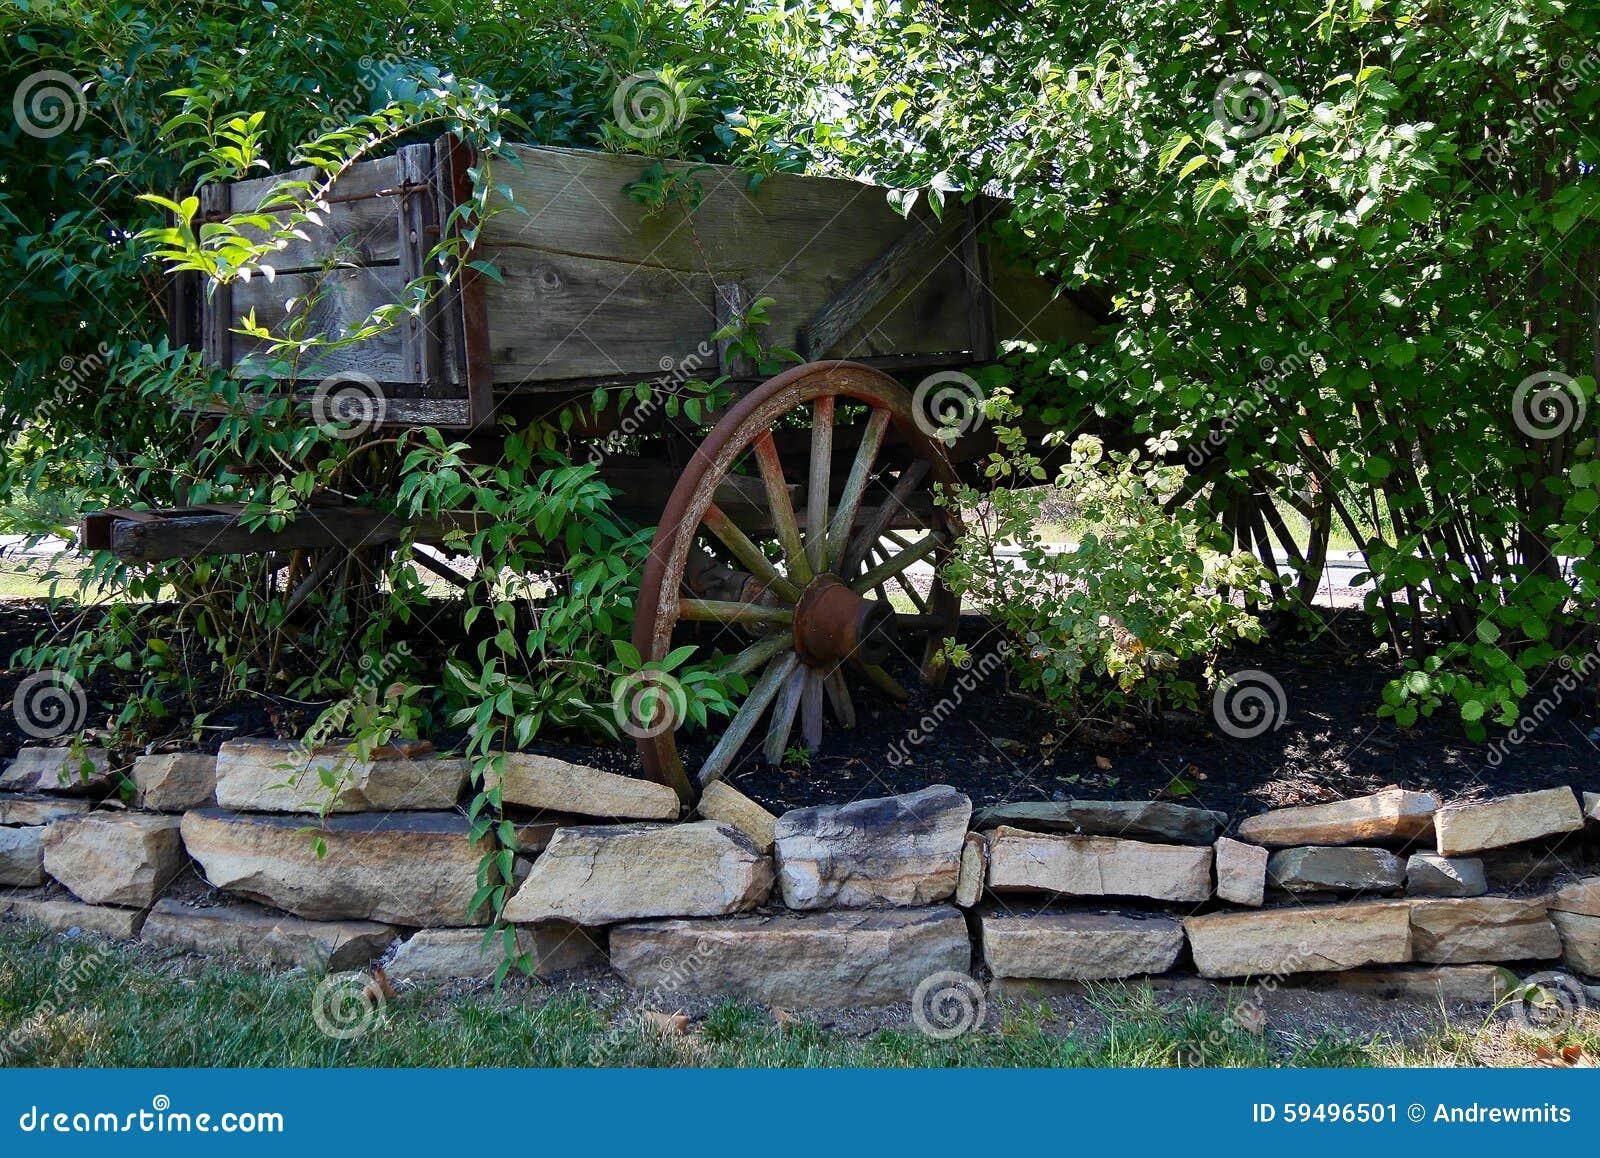 Decorative Garden Cart And Stone Border Stock Image - Image of ...